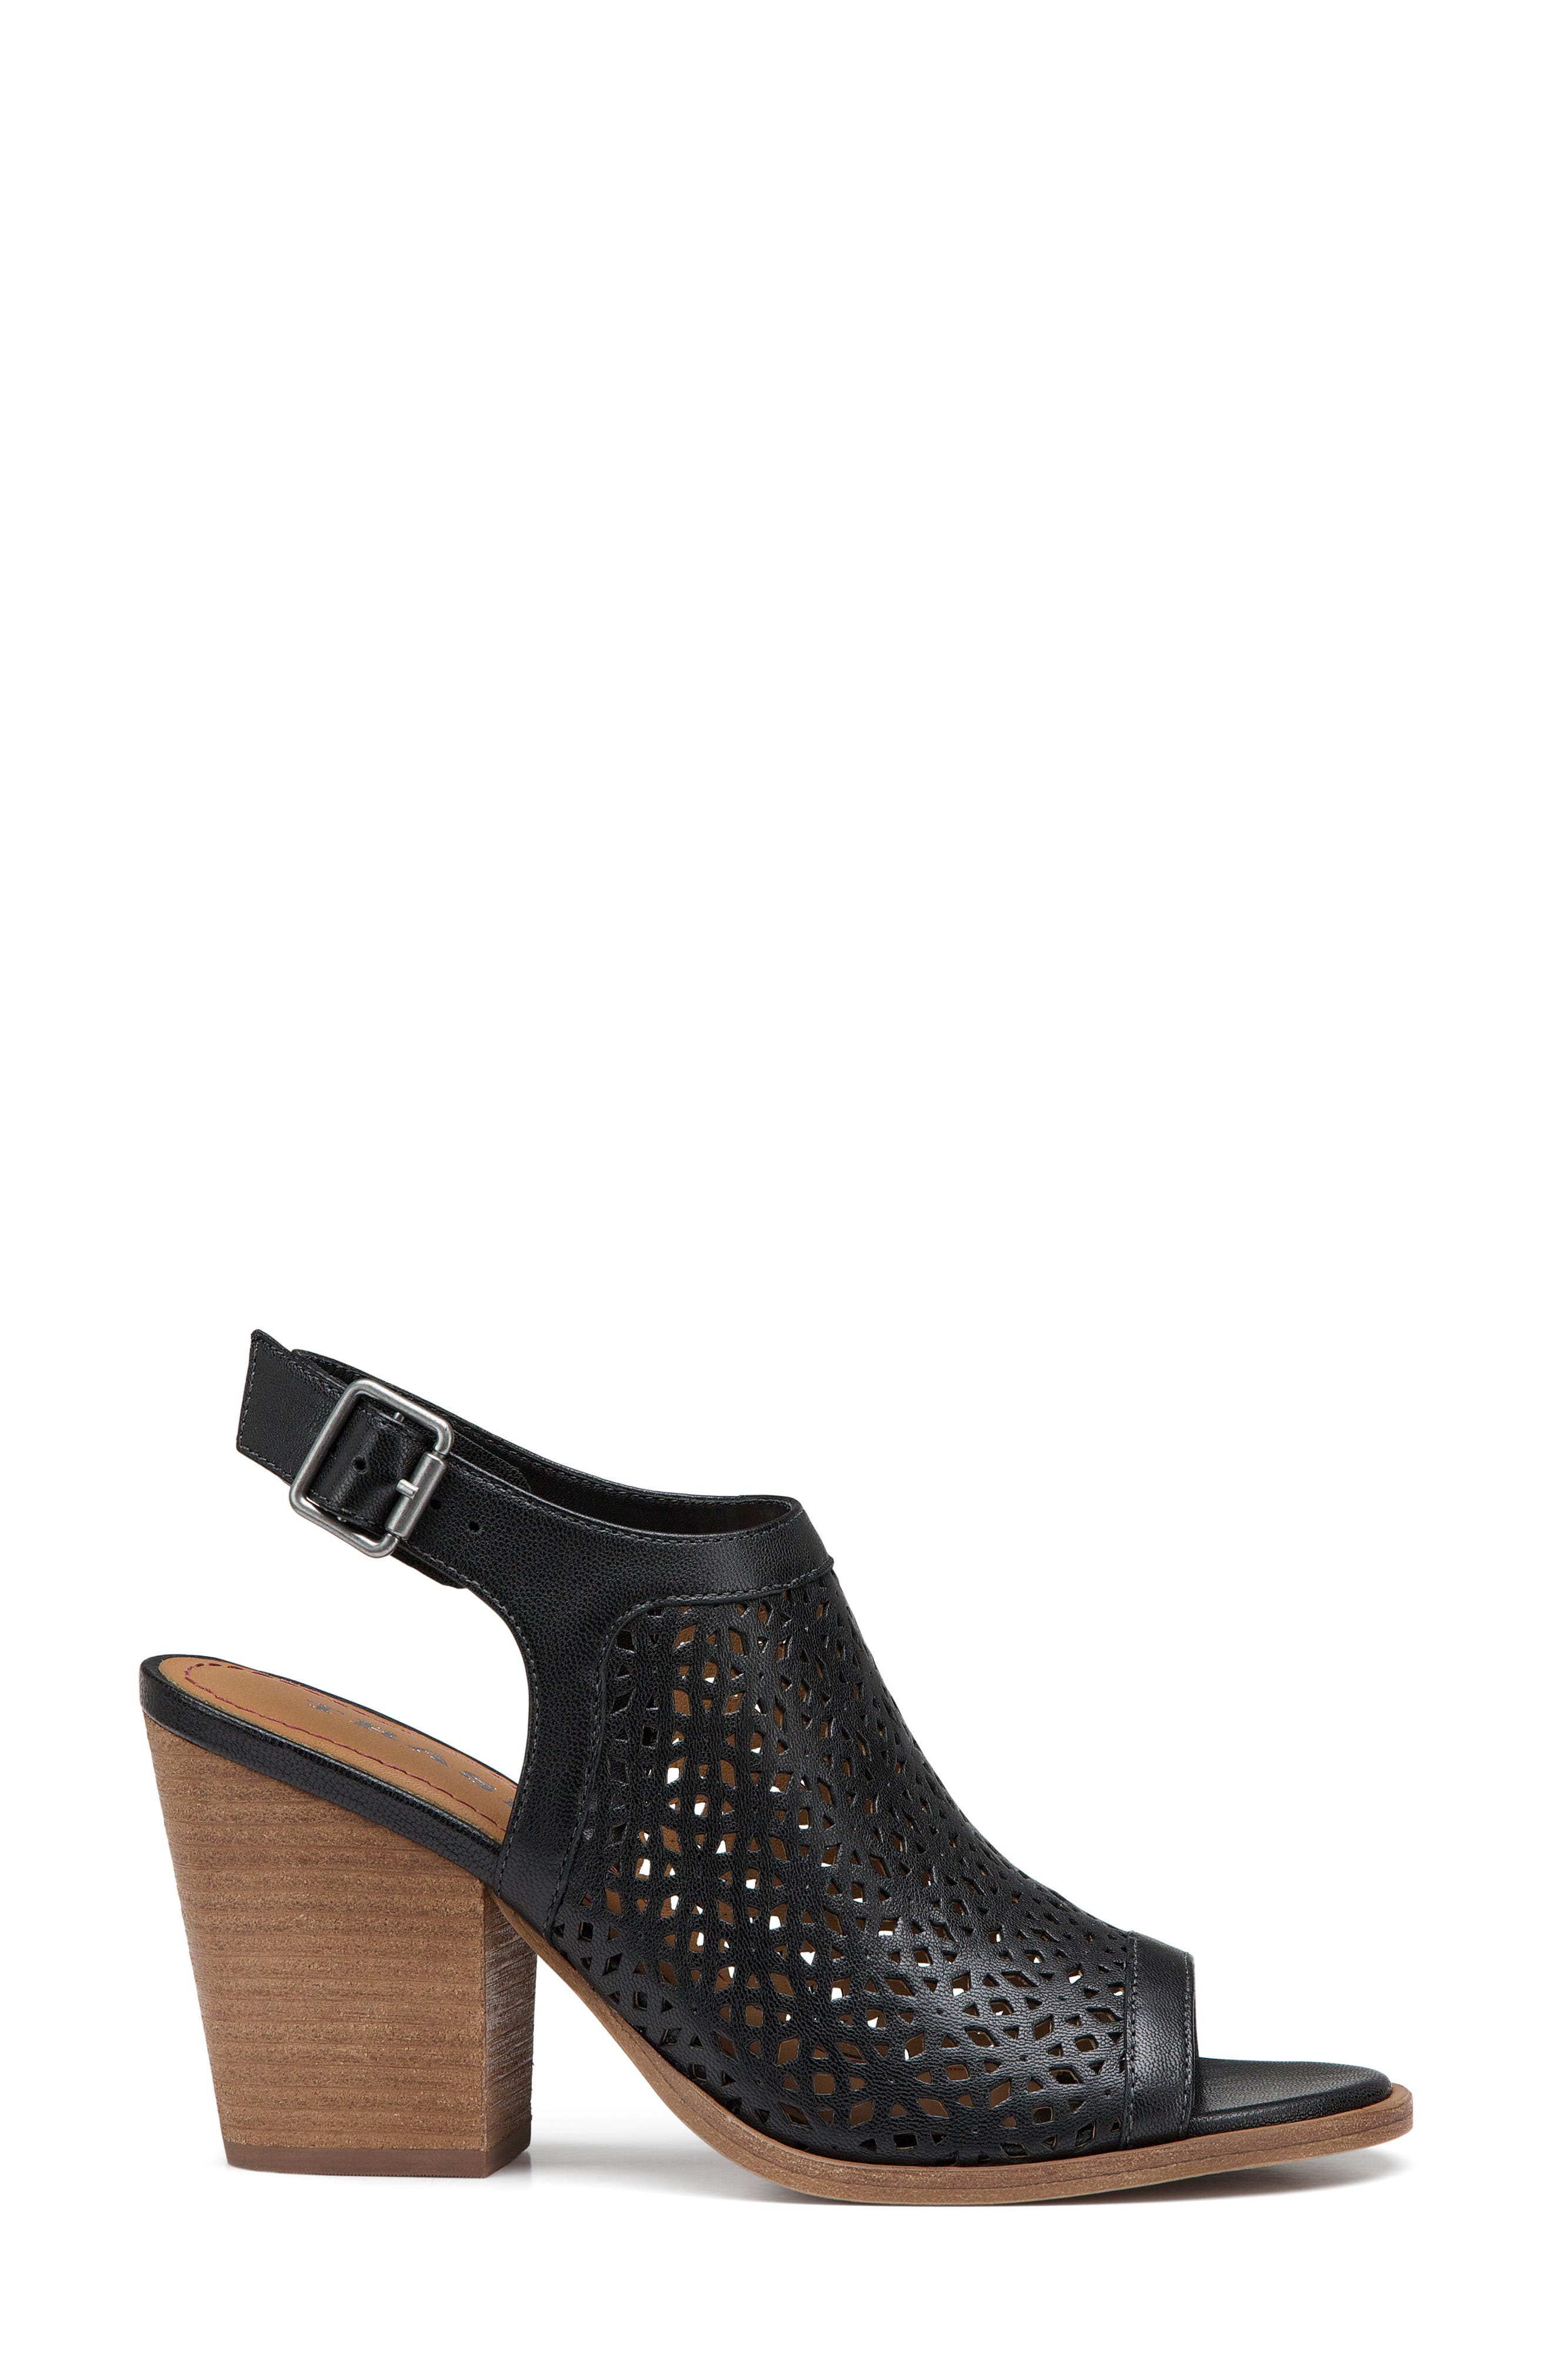 Parker Slingback Sandal,                             Alternate thumbnail 3, color,                             Black Leather